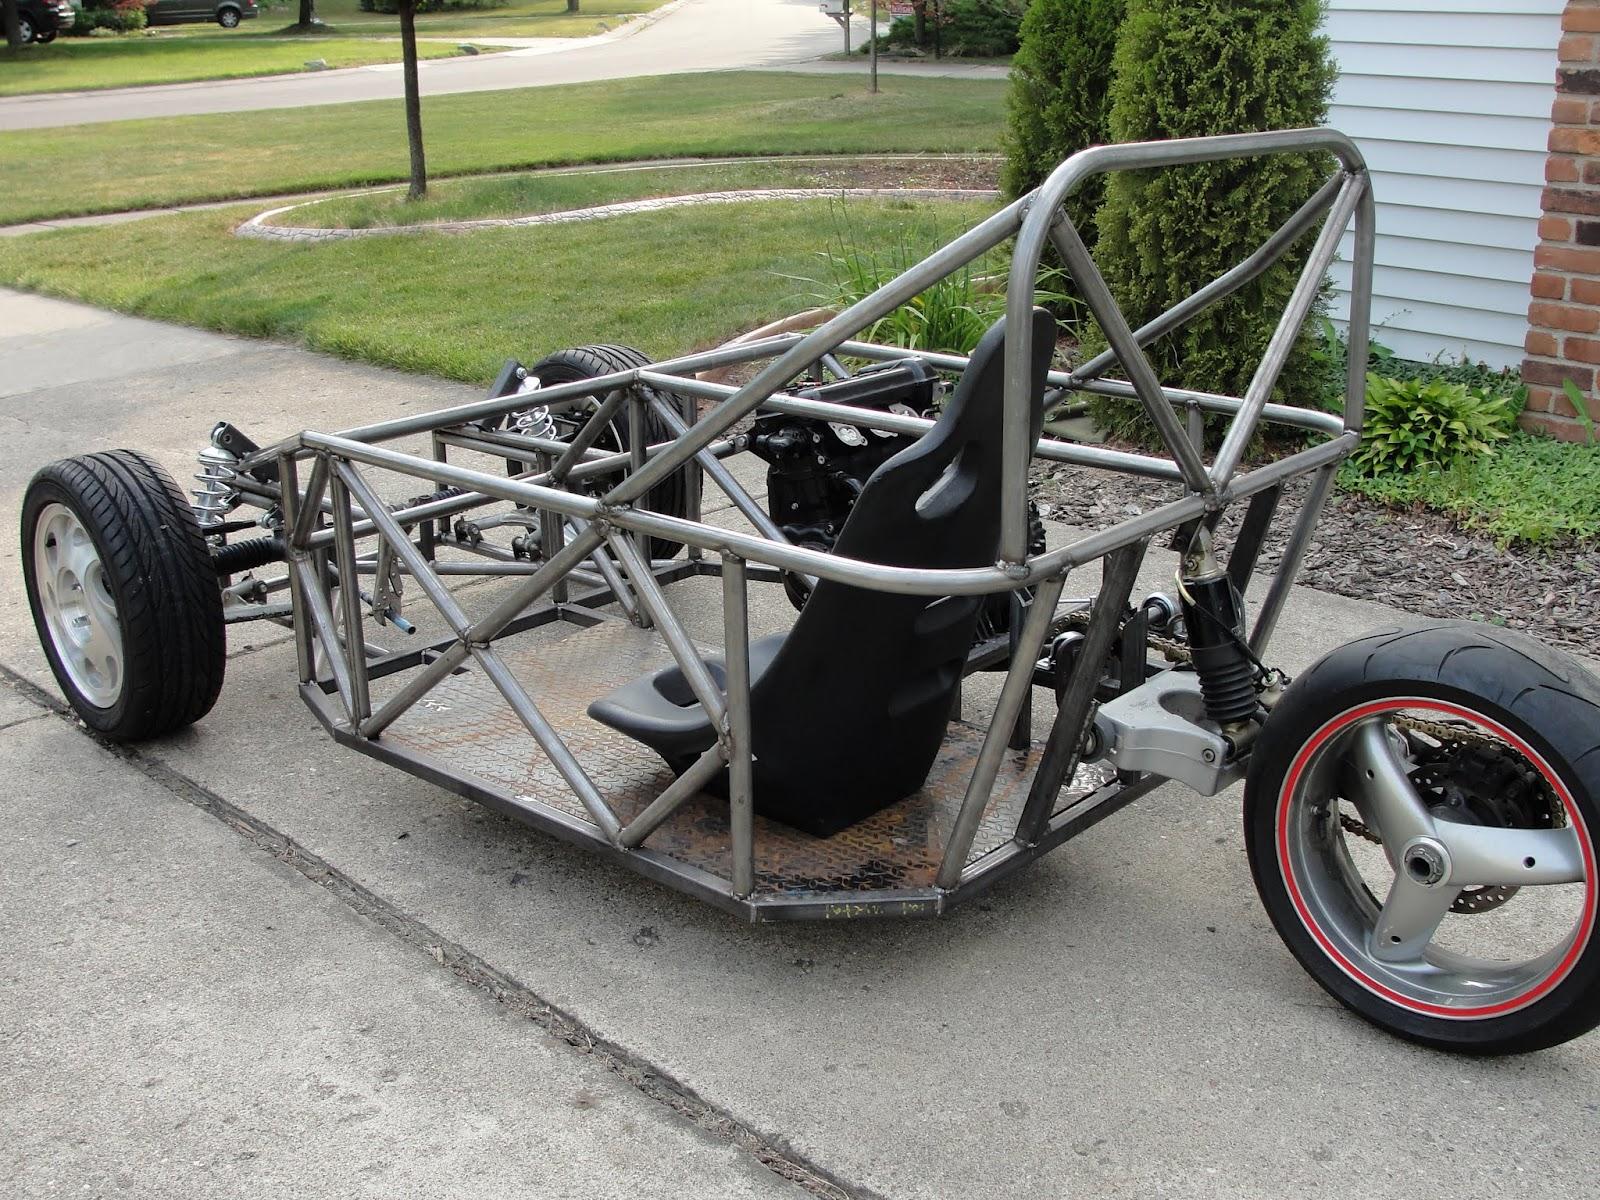 Vw Trike Frame Plans - Page 6 - Frame Design & Reviews ✓